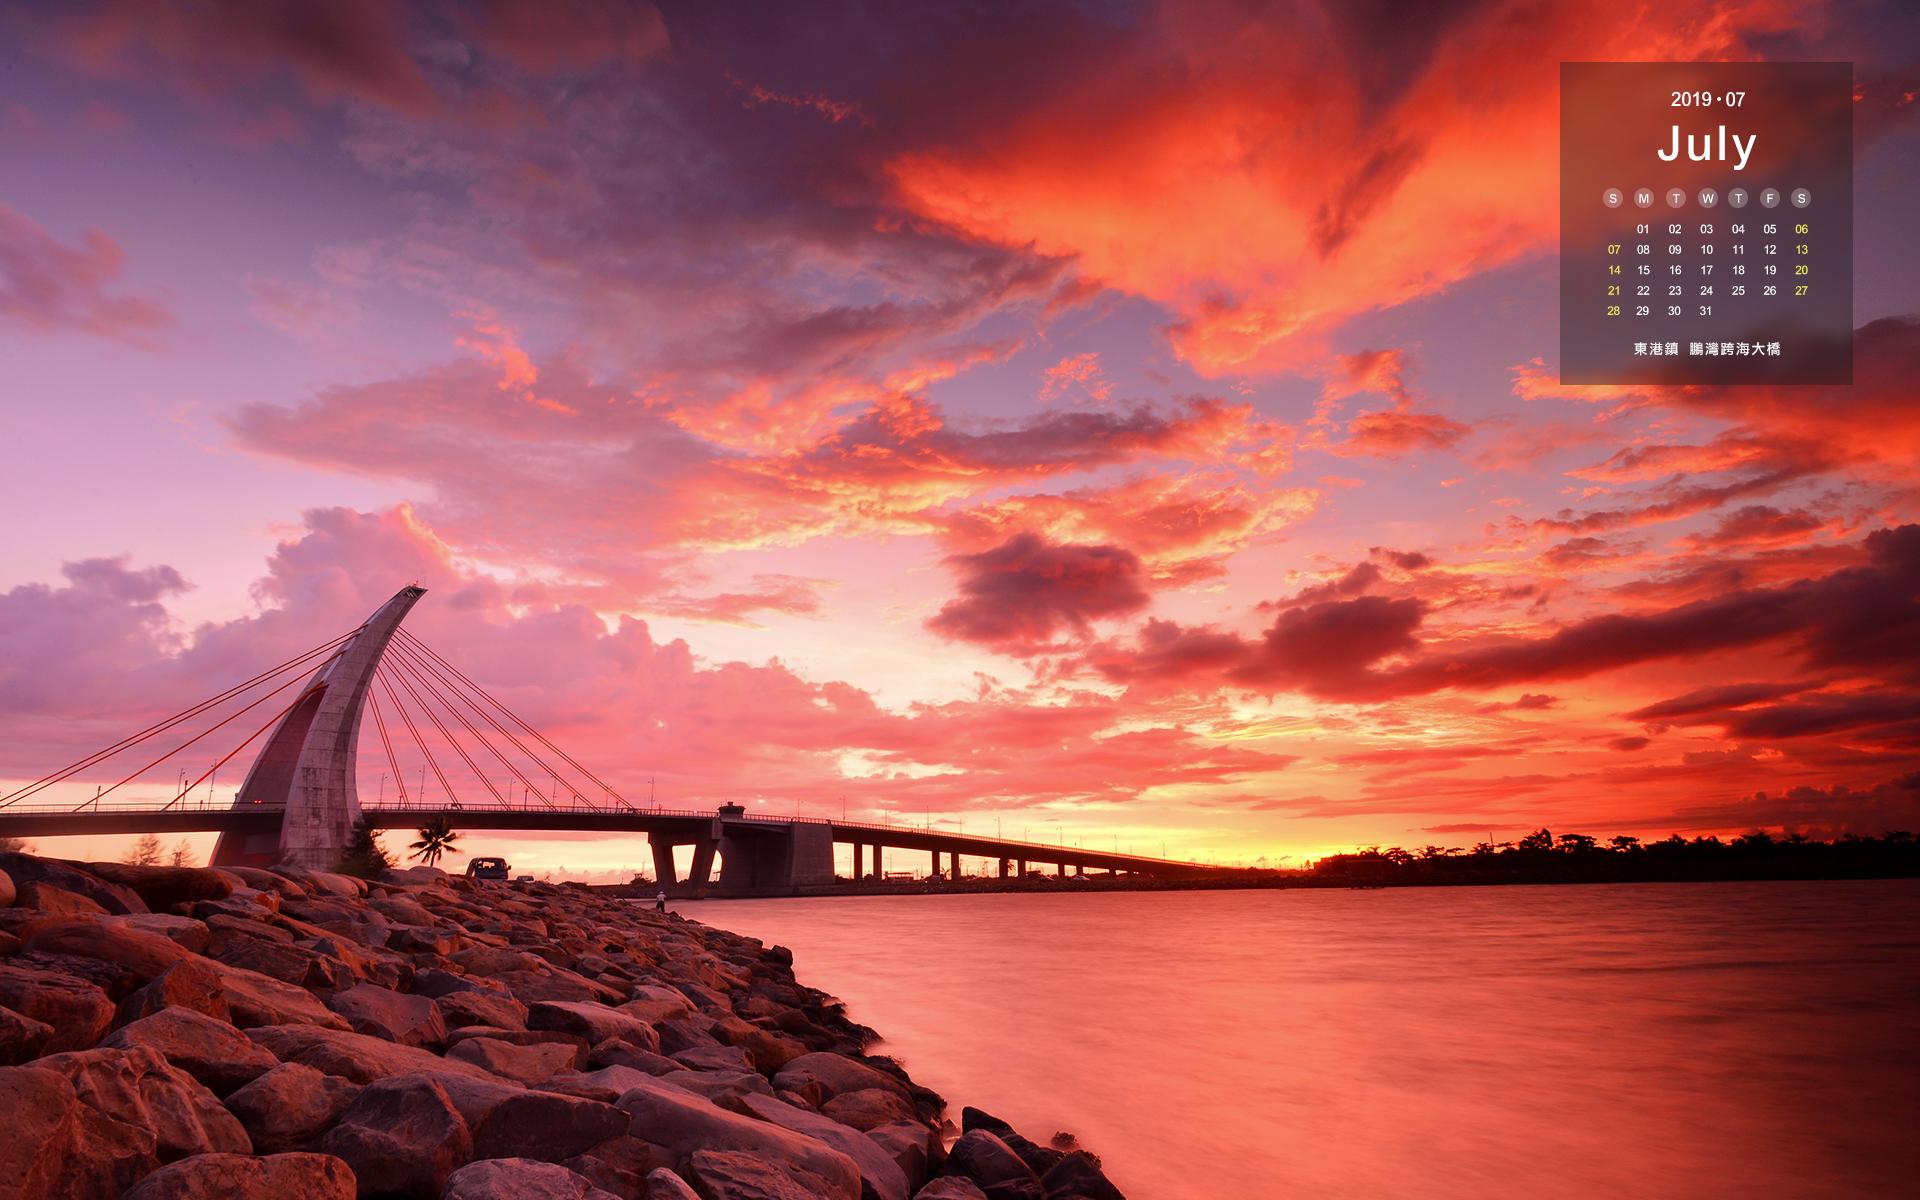 Wallpaper Download - DAPENG BAY NATIONAL SCENIC AREA